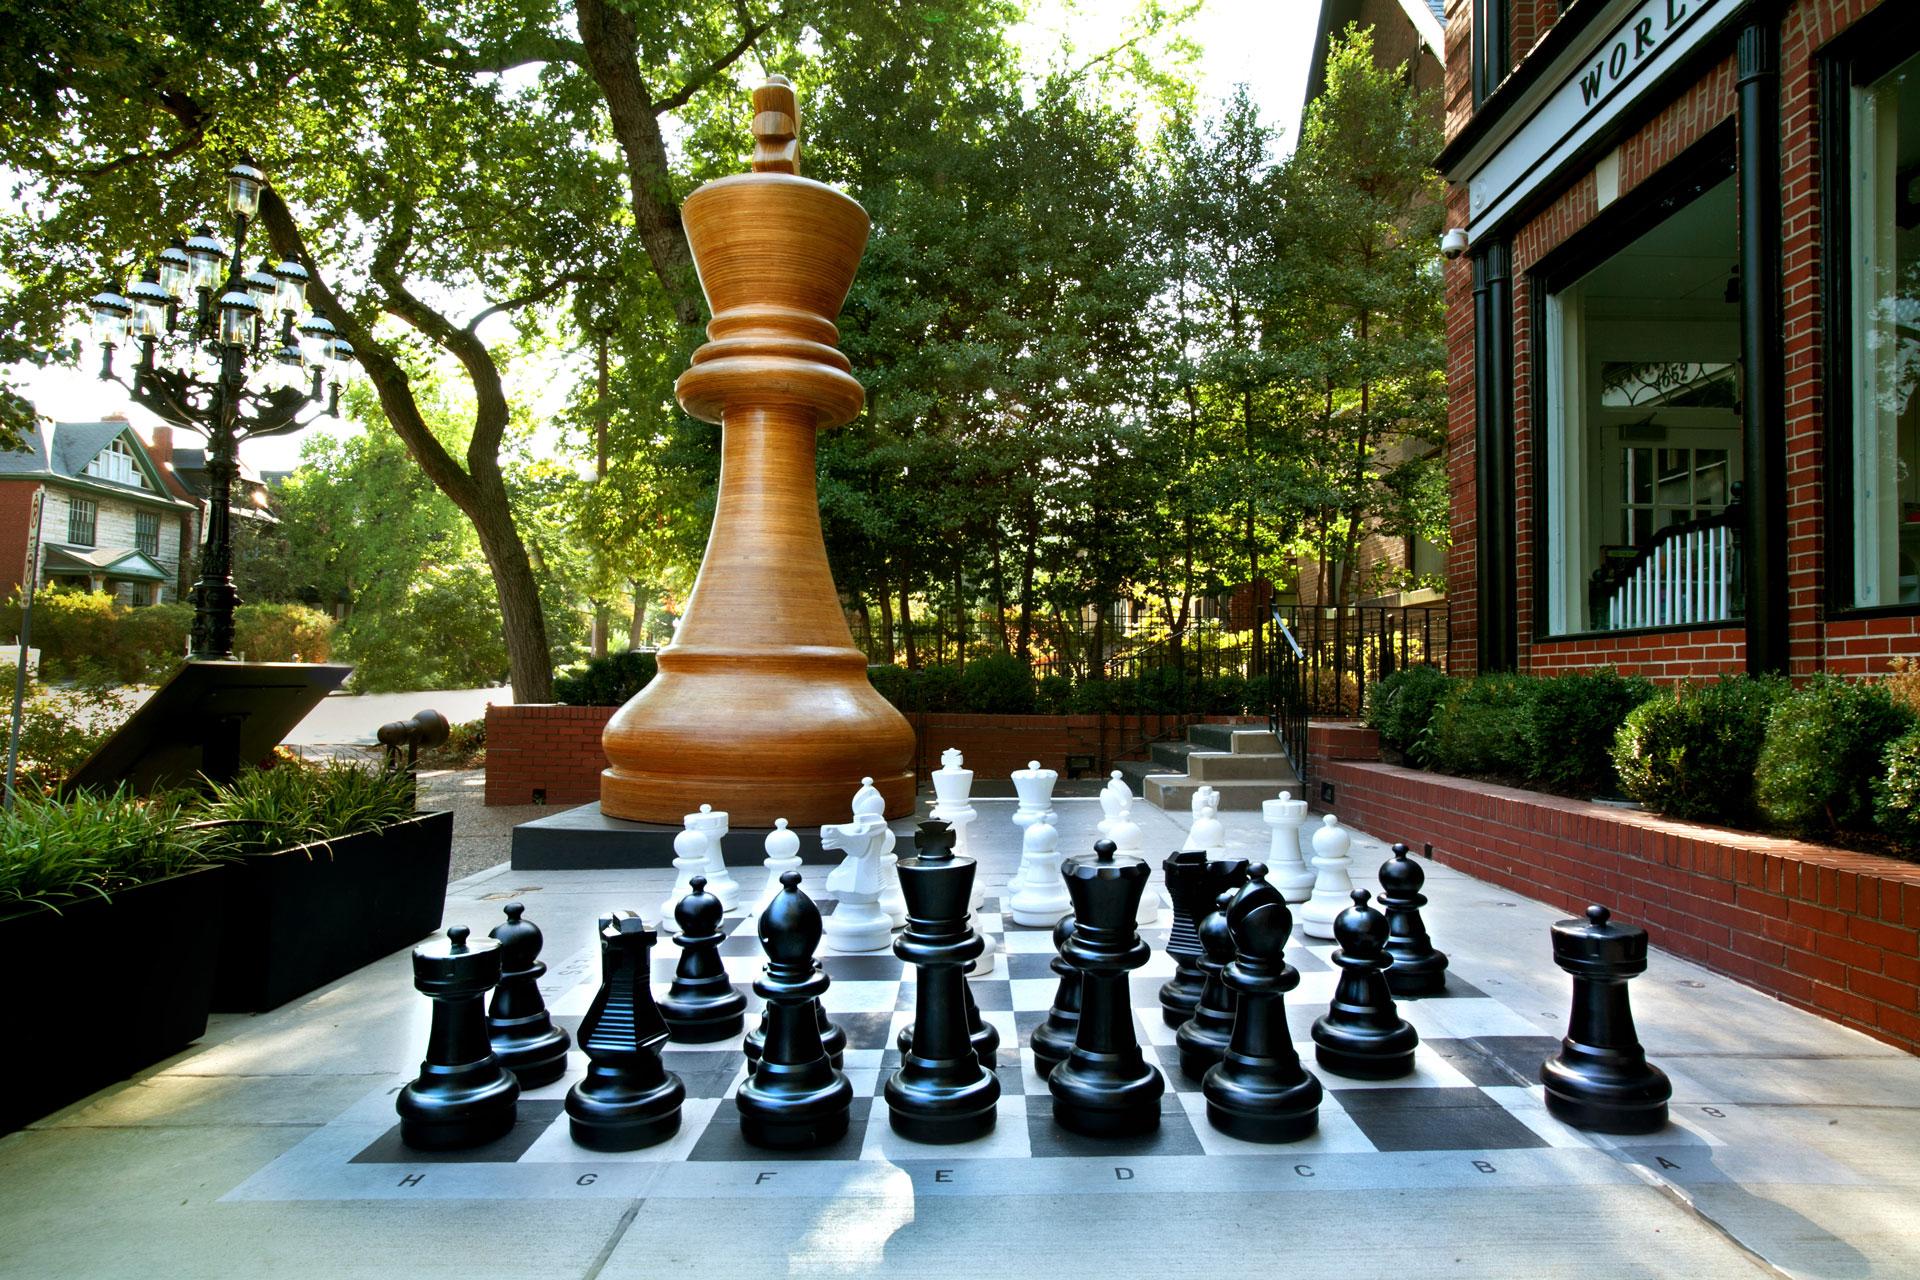 World's Largest Chess Piece, 2012